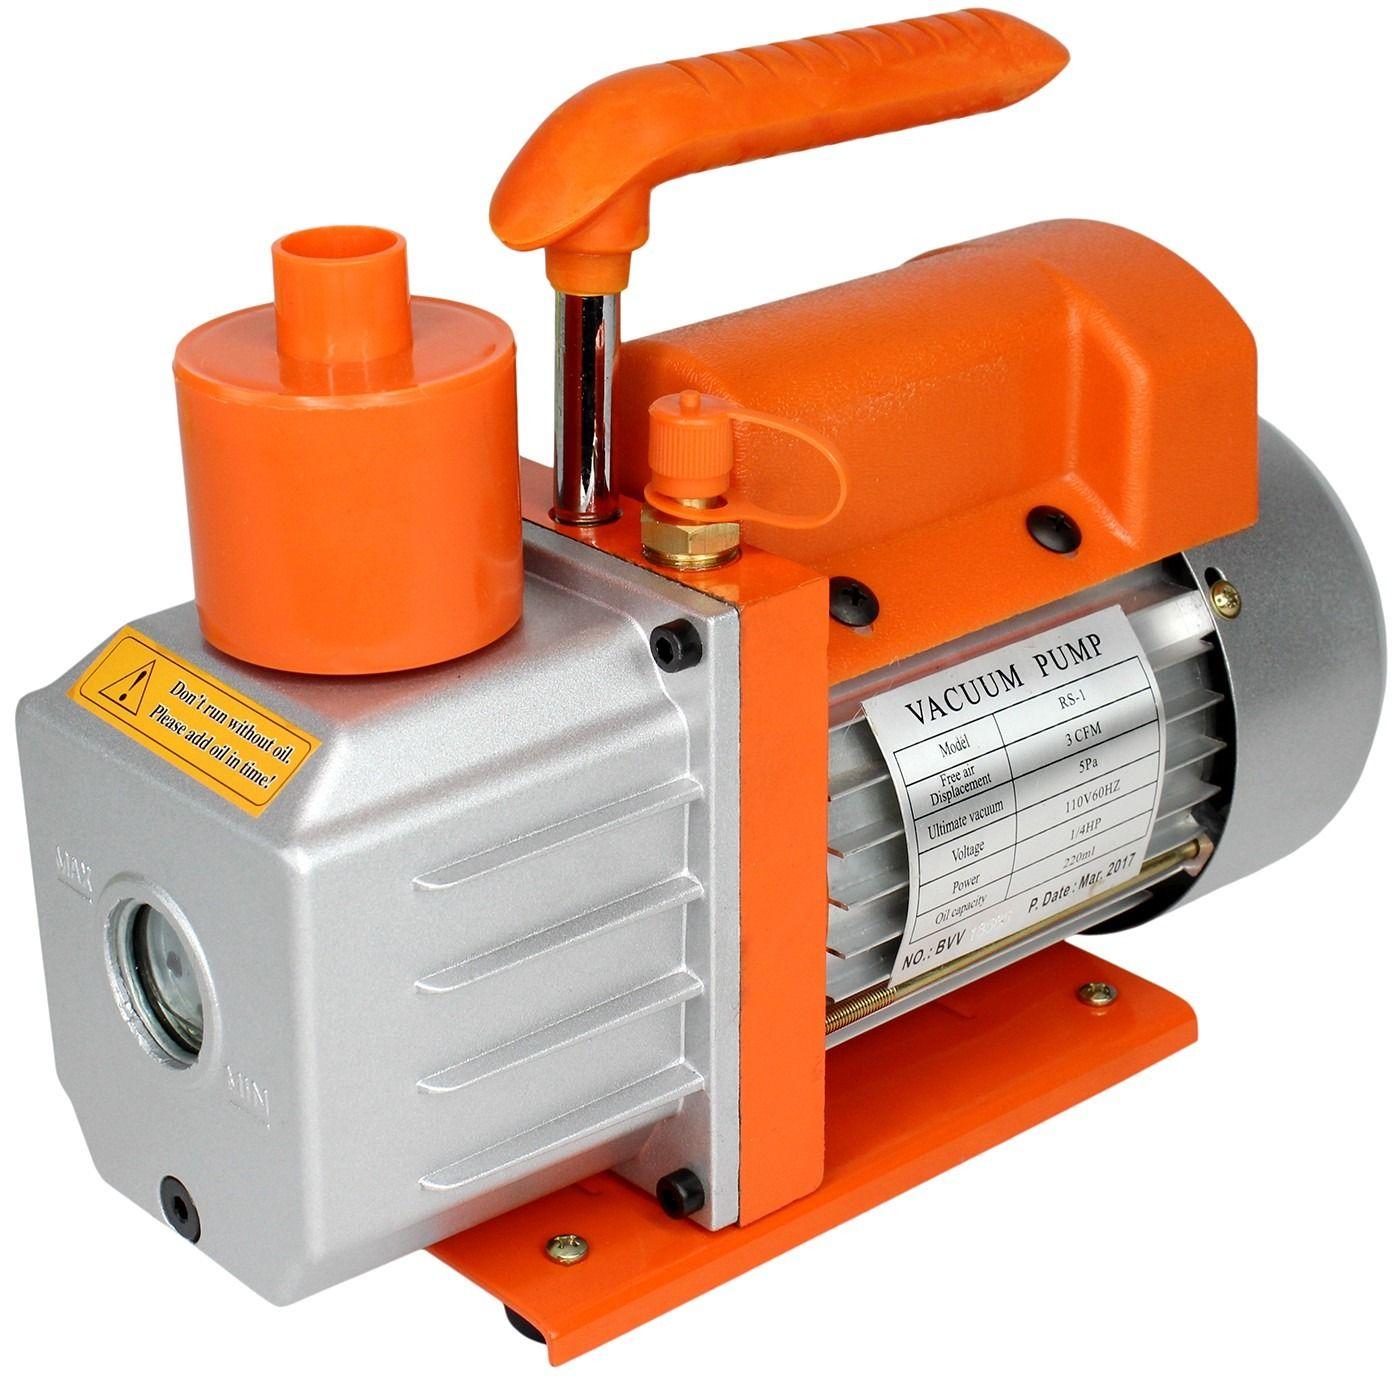 Key Features Internal Check Valve Oil Mist Filter Cap Larger Oil Reservoir For Longer Oil Life Lightweight Rubber Feet For Vacuum Pump Vacuums Noise Dampening